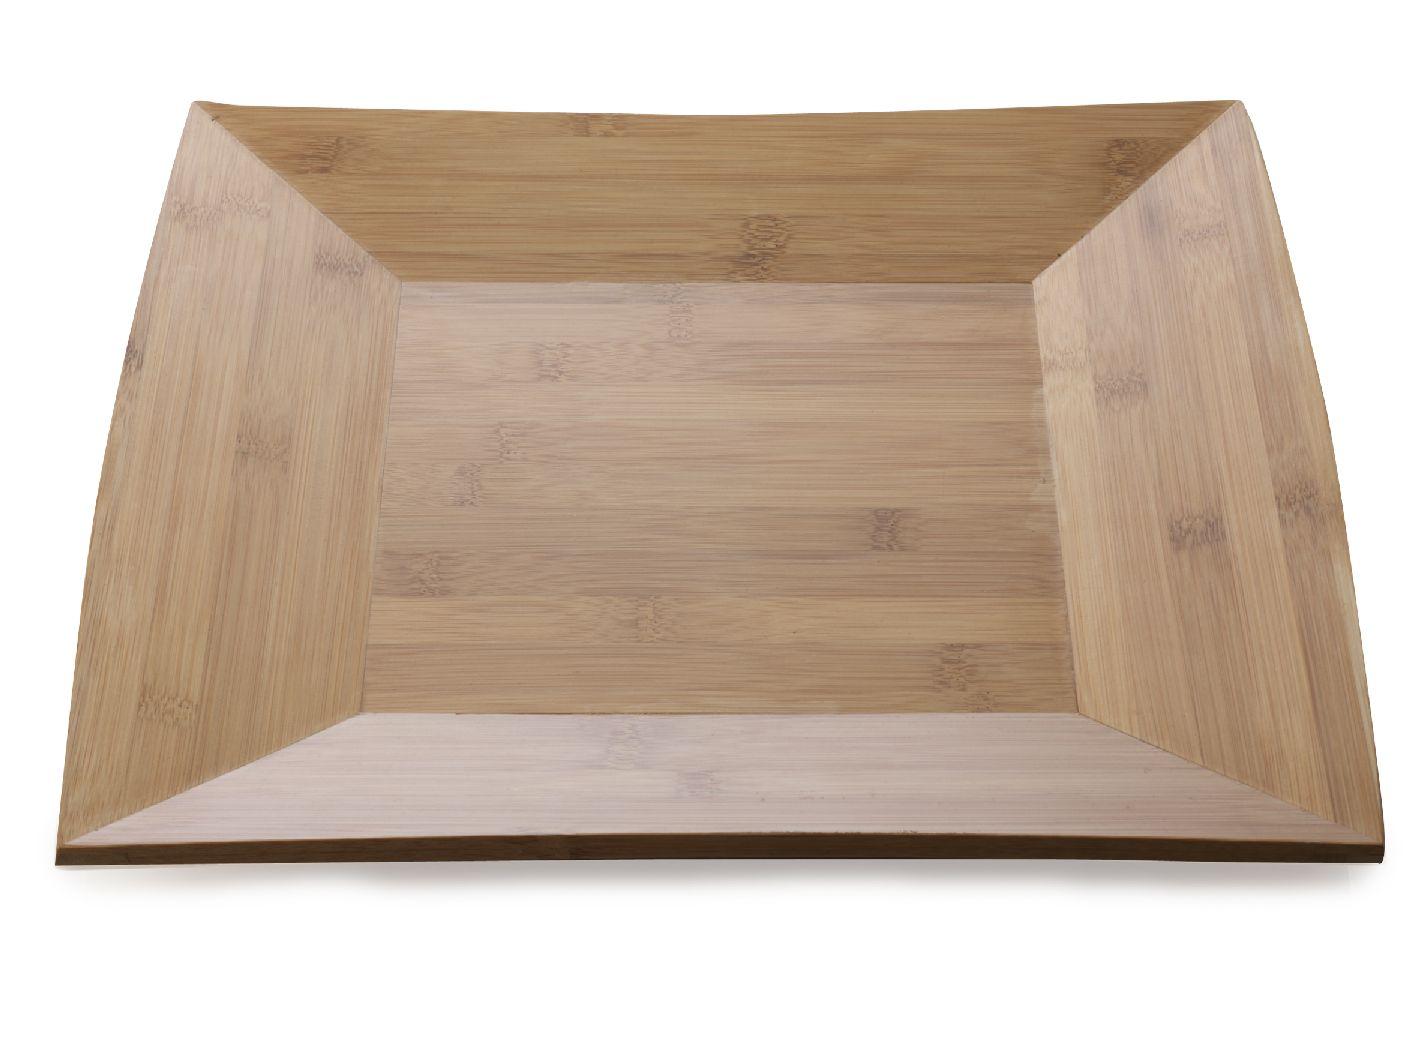 Čtvercový dřevěný talíř Bamboozled 30 cm Bambus - Maxwell&Williams